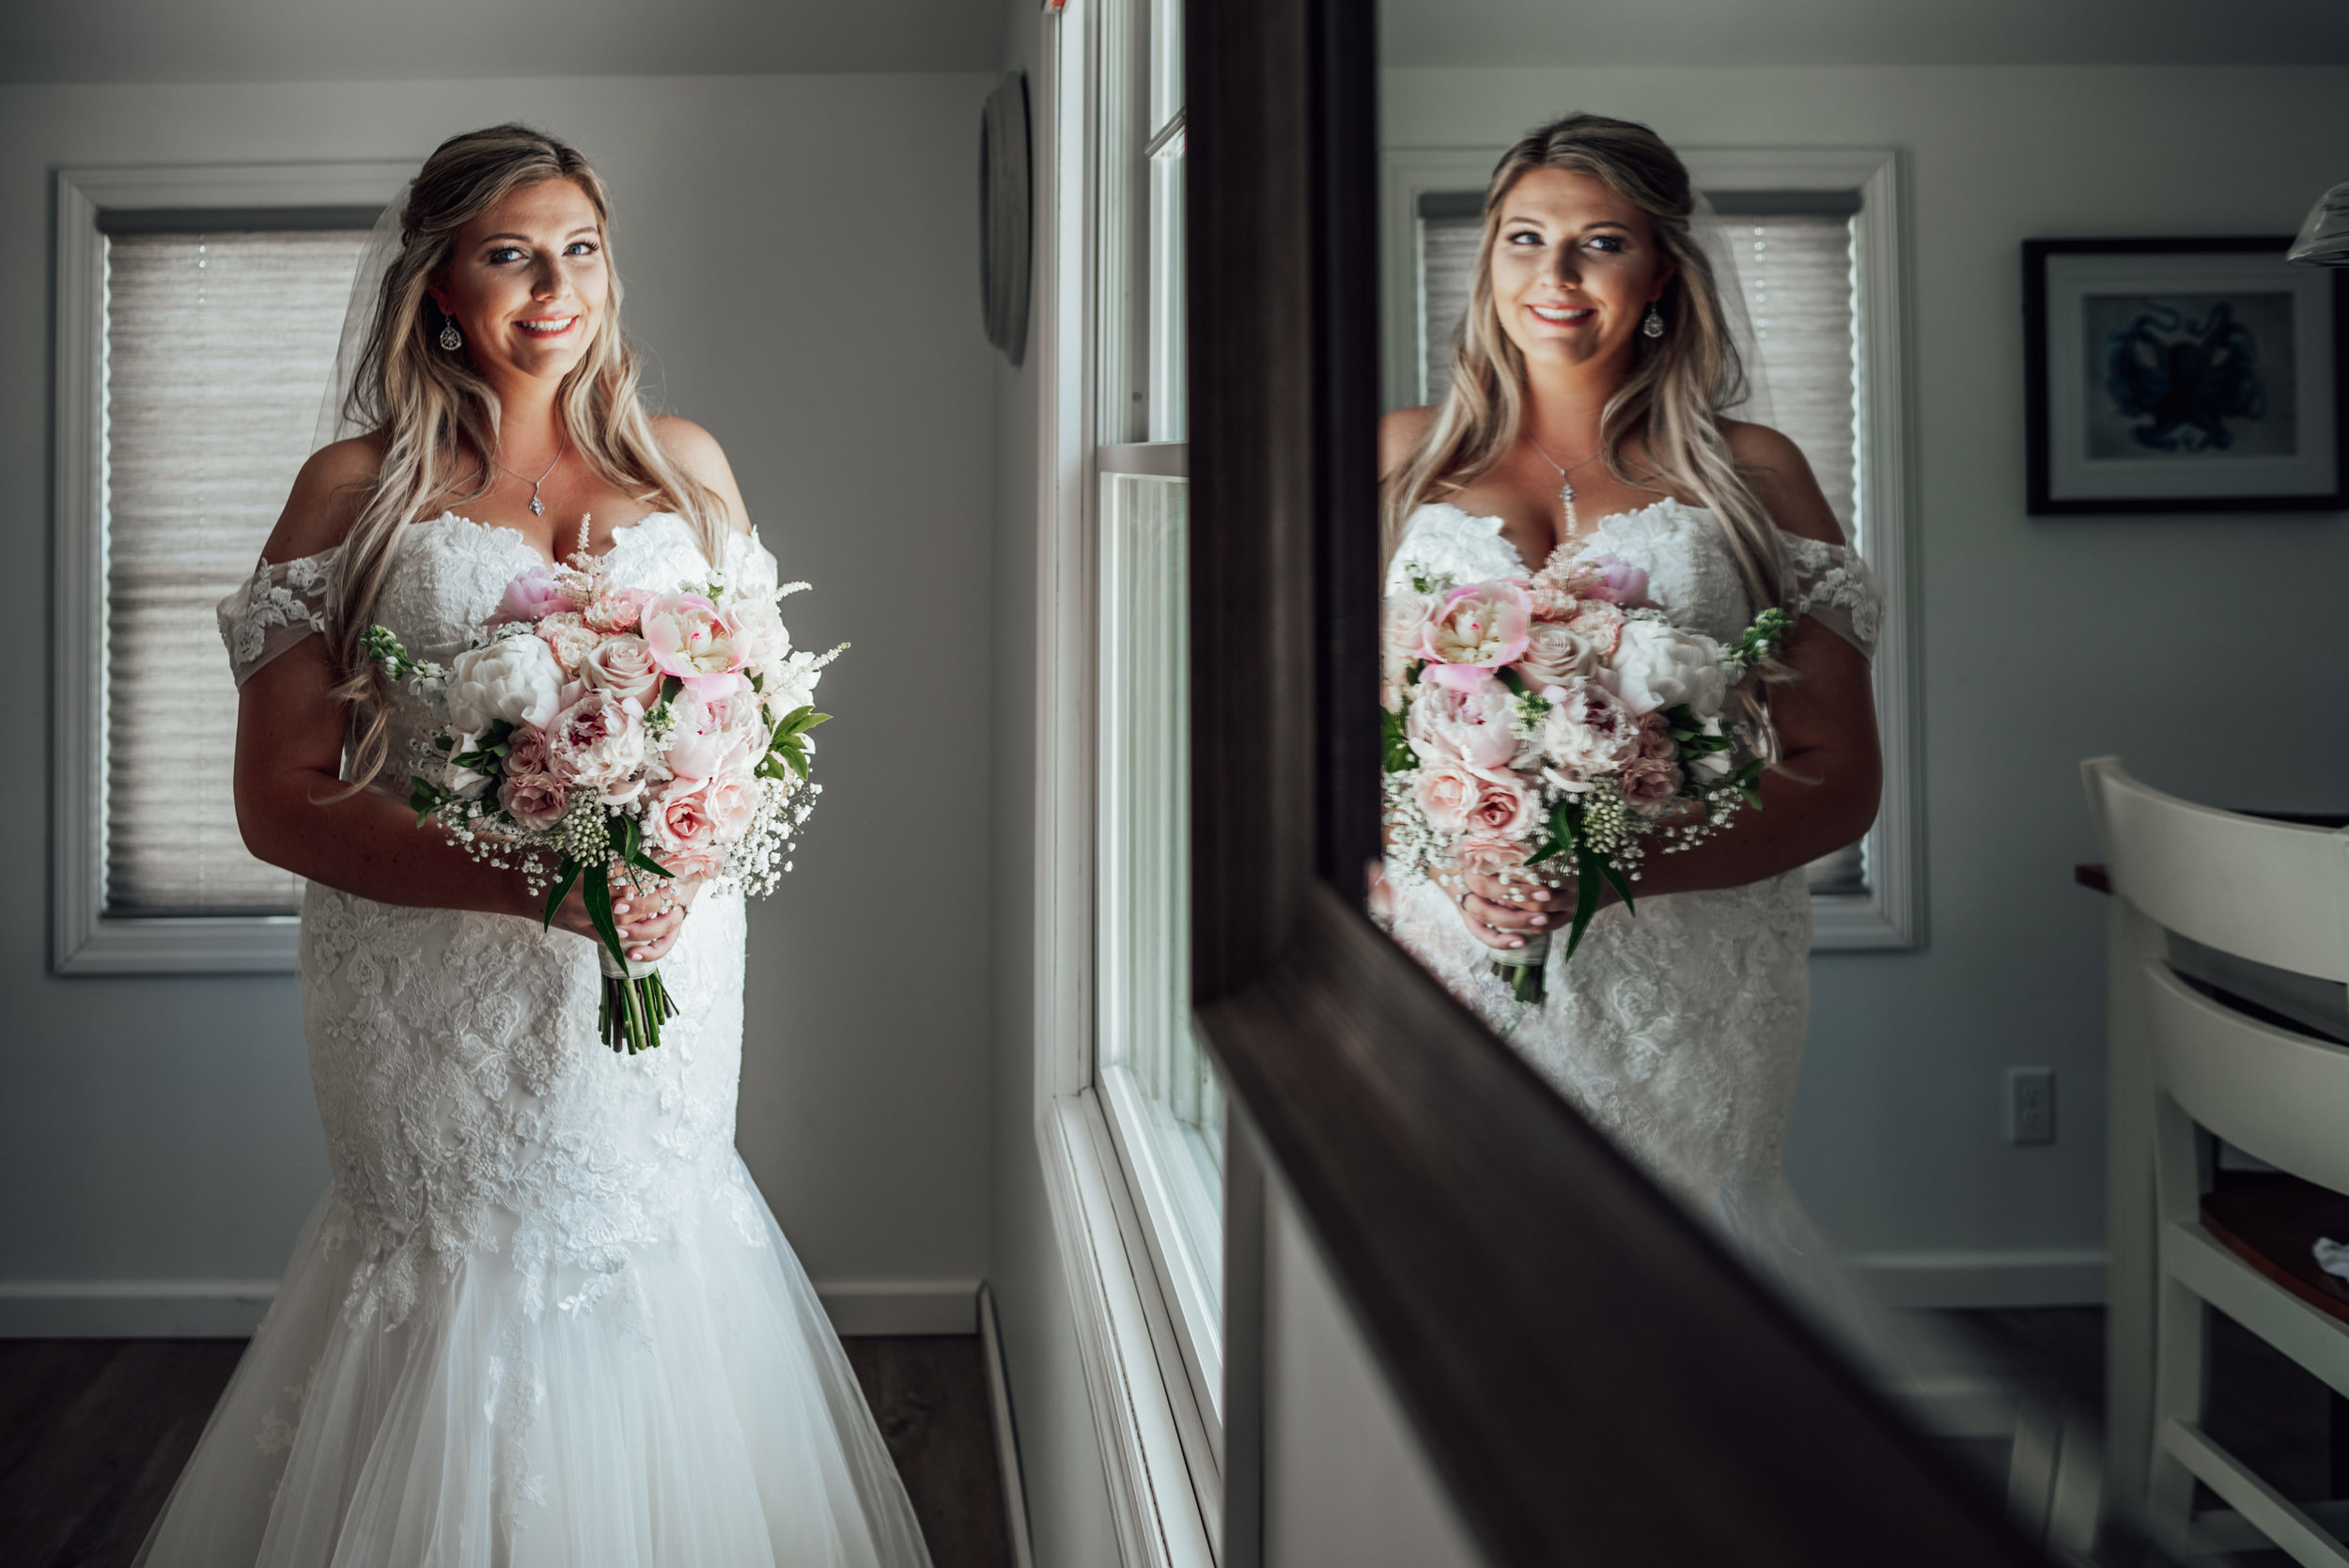 New Jersey Wedding Photographer, Felsberg Photography LBI wedding photography 35.jpg